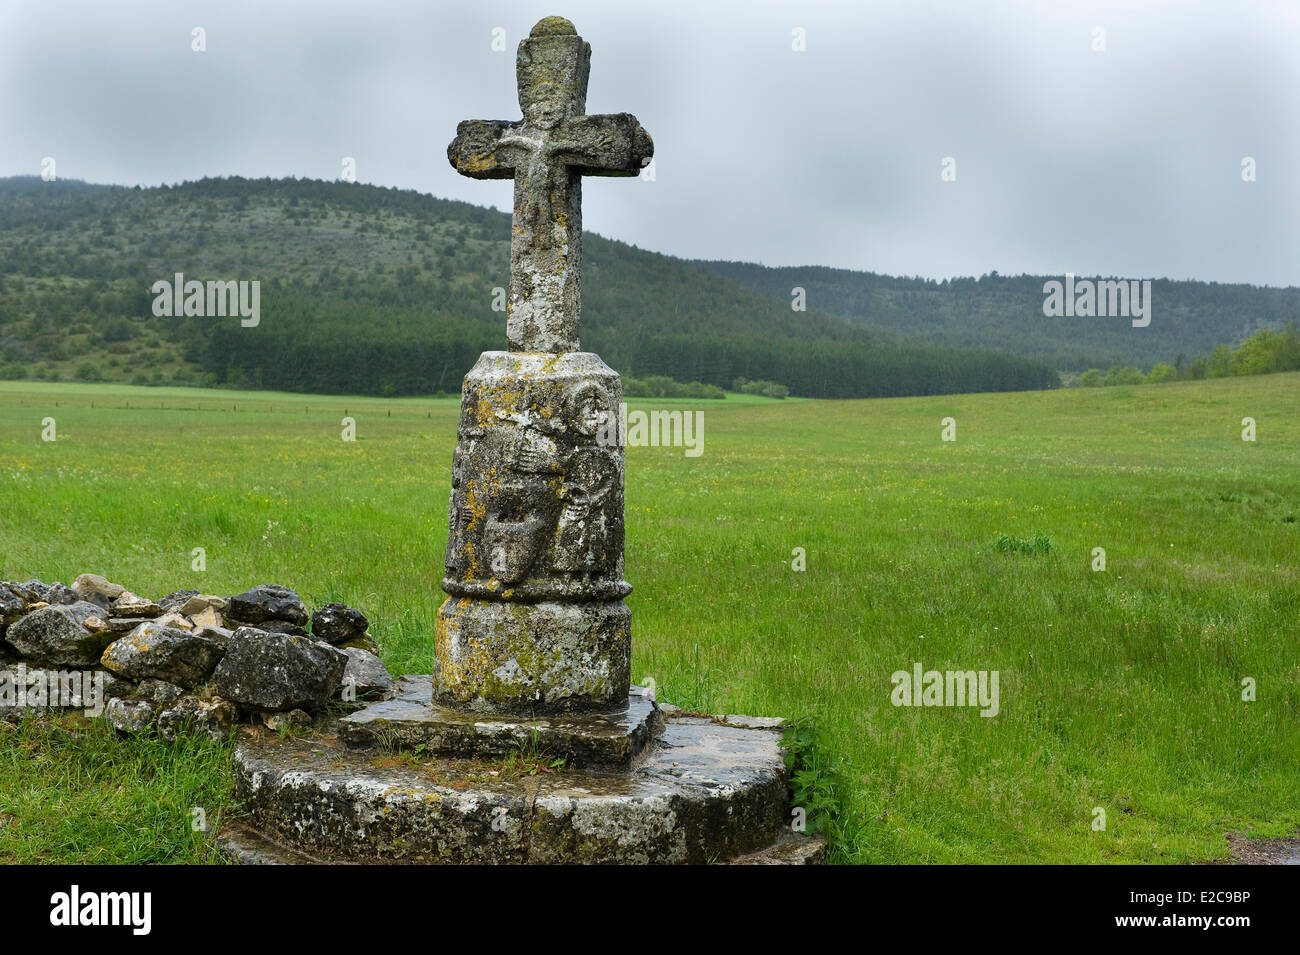 France, Lozere, The Buffre crosses carved granite, Causse Sauveterre - Stock Image